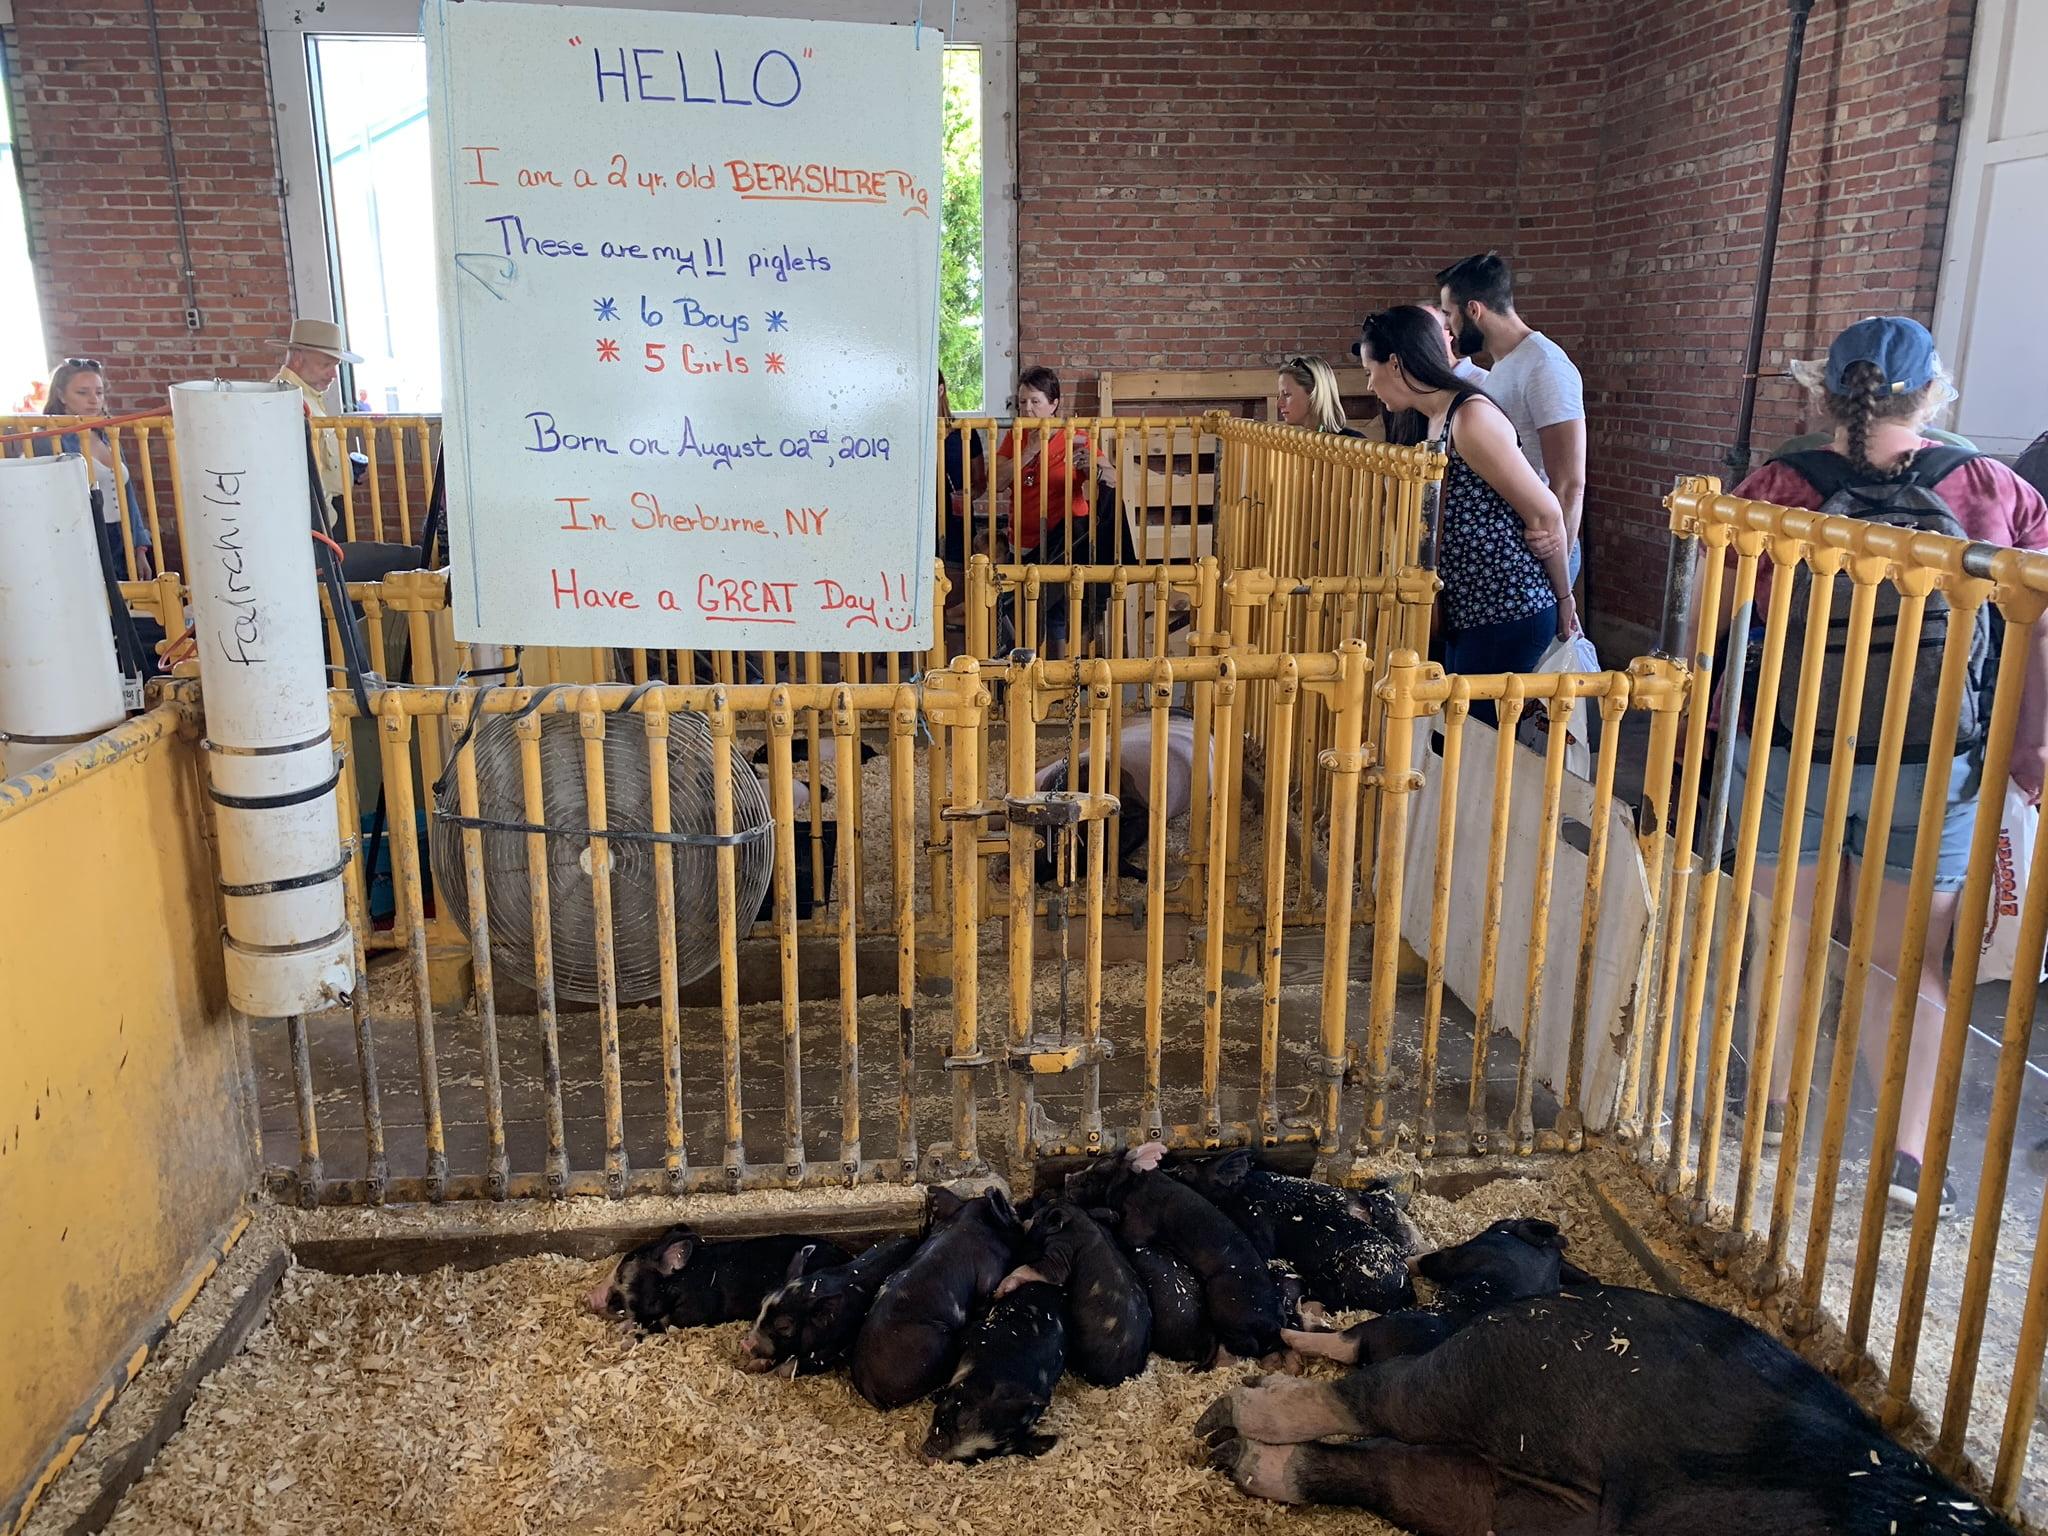 Piglets at NY State Fair